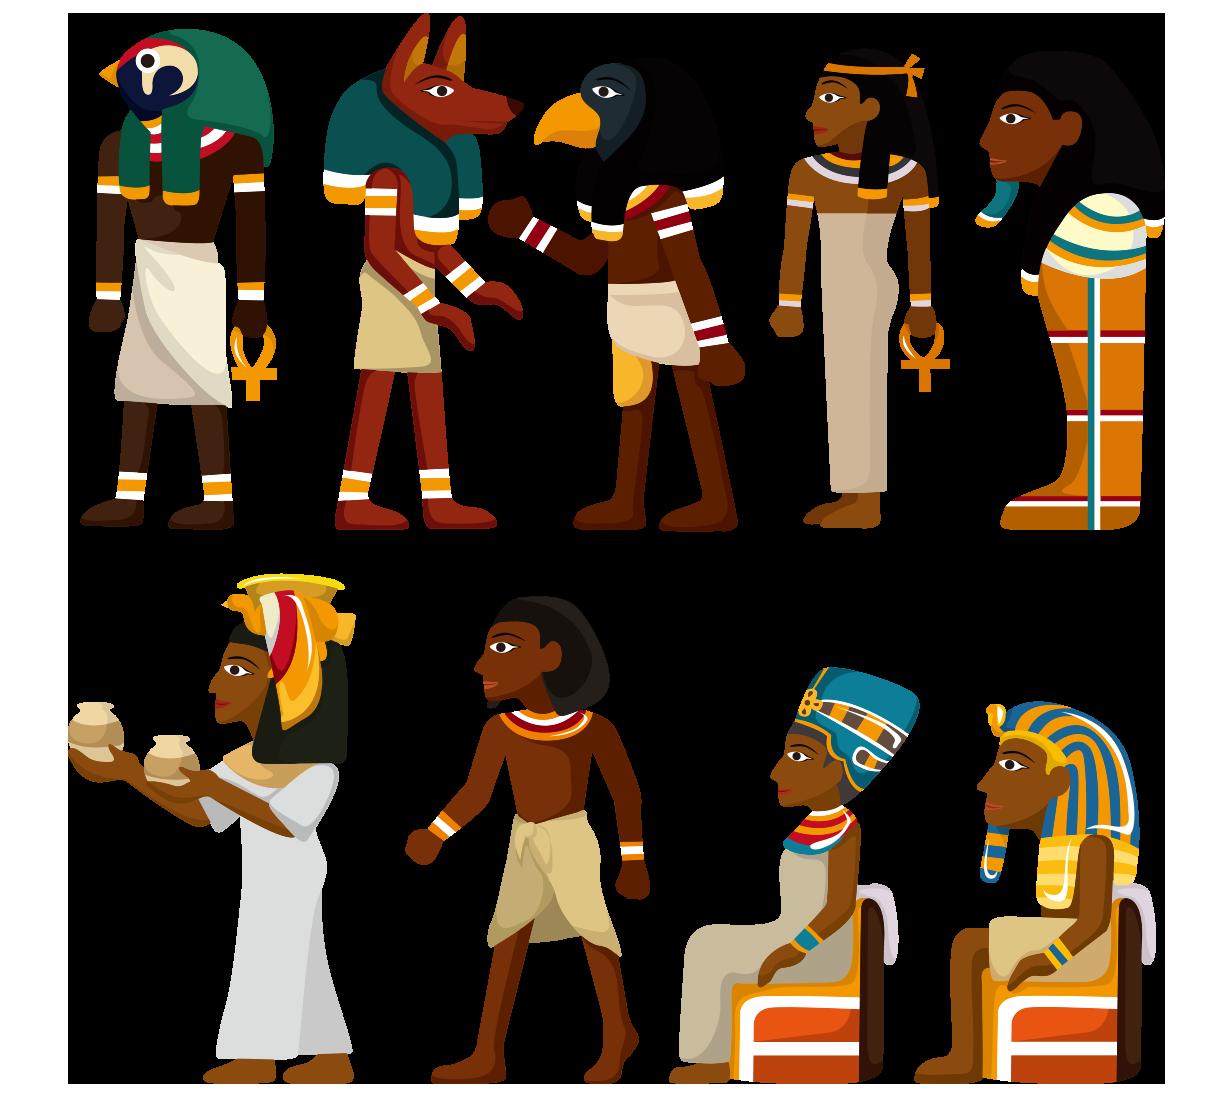 Egypt clipart egyptian figure. Ancient hieroglyphs cartoon painted